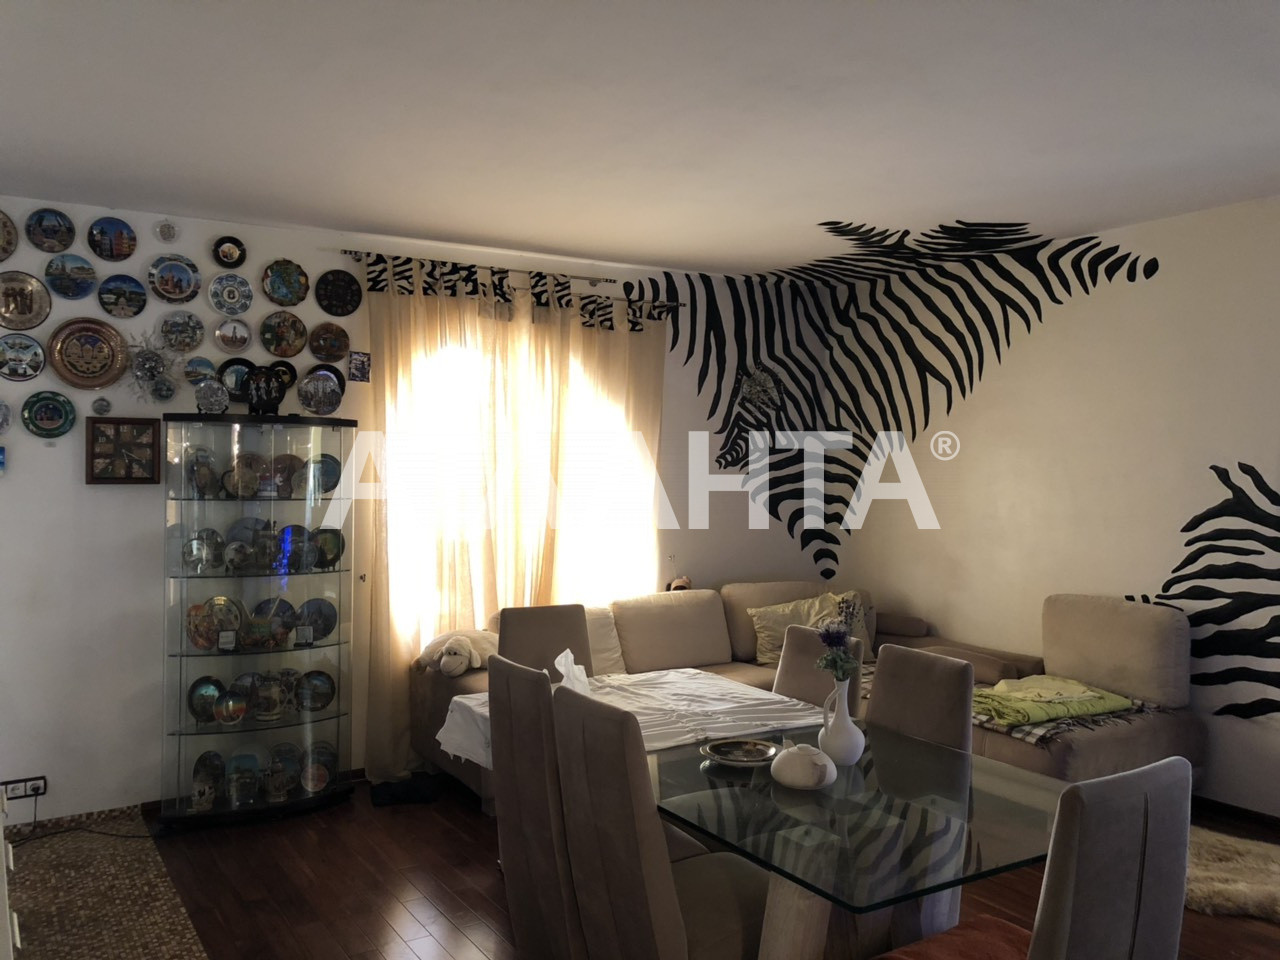 Продается 3-комнатная Квартира на ул. 1 Мая — 135 000 у.е. (фото №3)